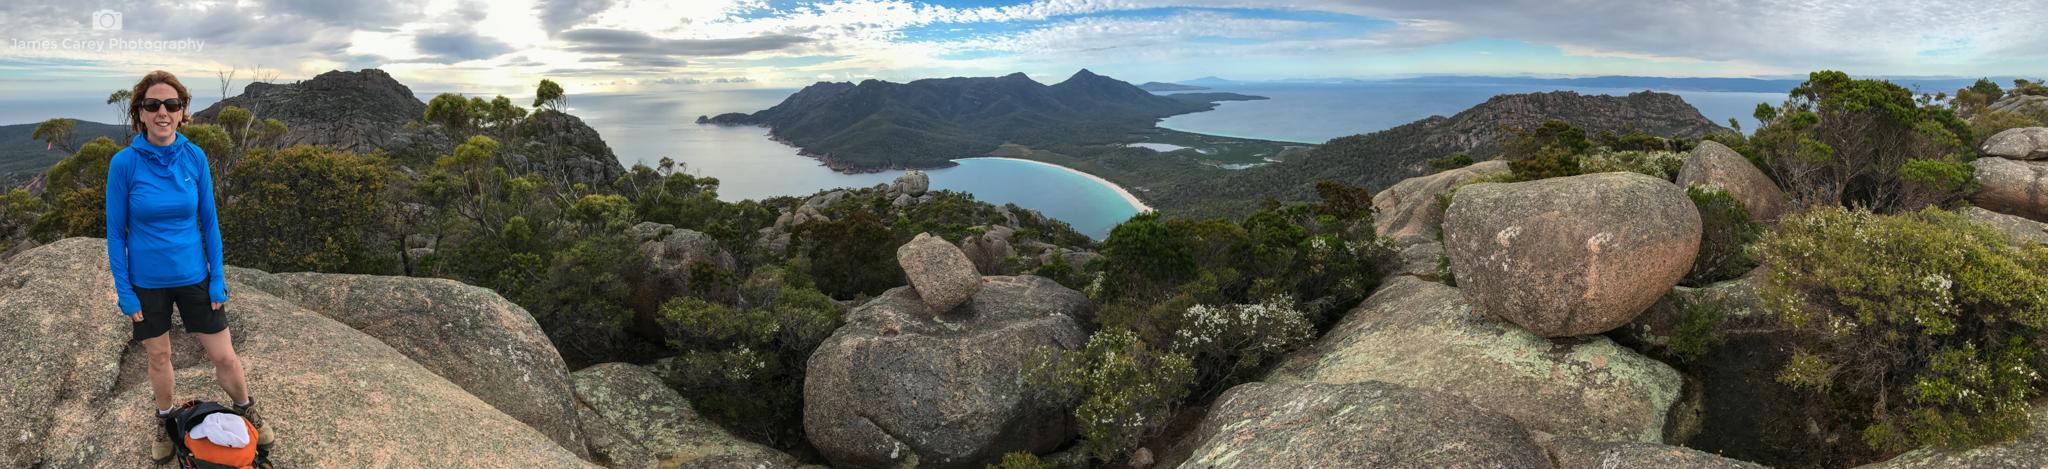 LONR - Tasmania-13.jpg